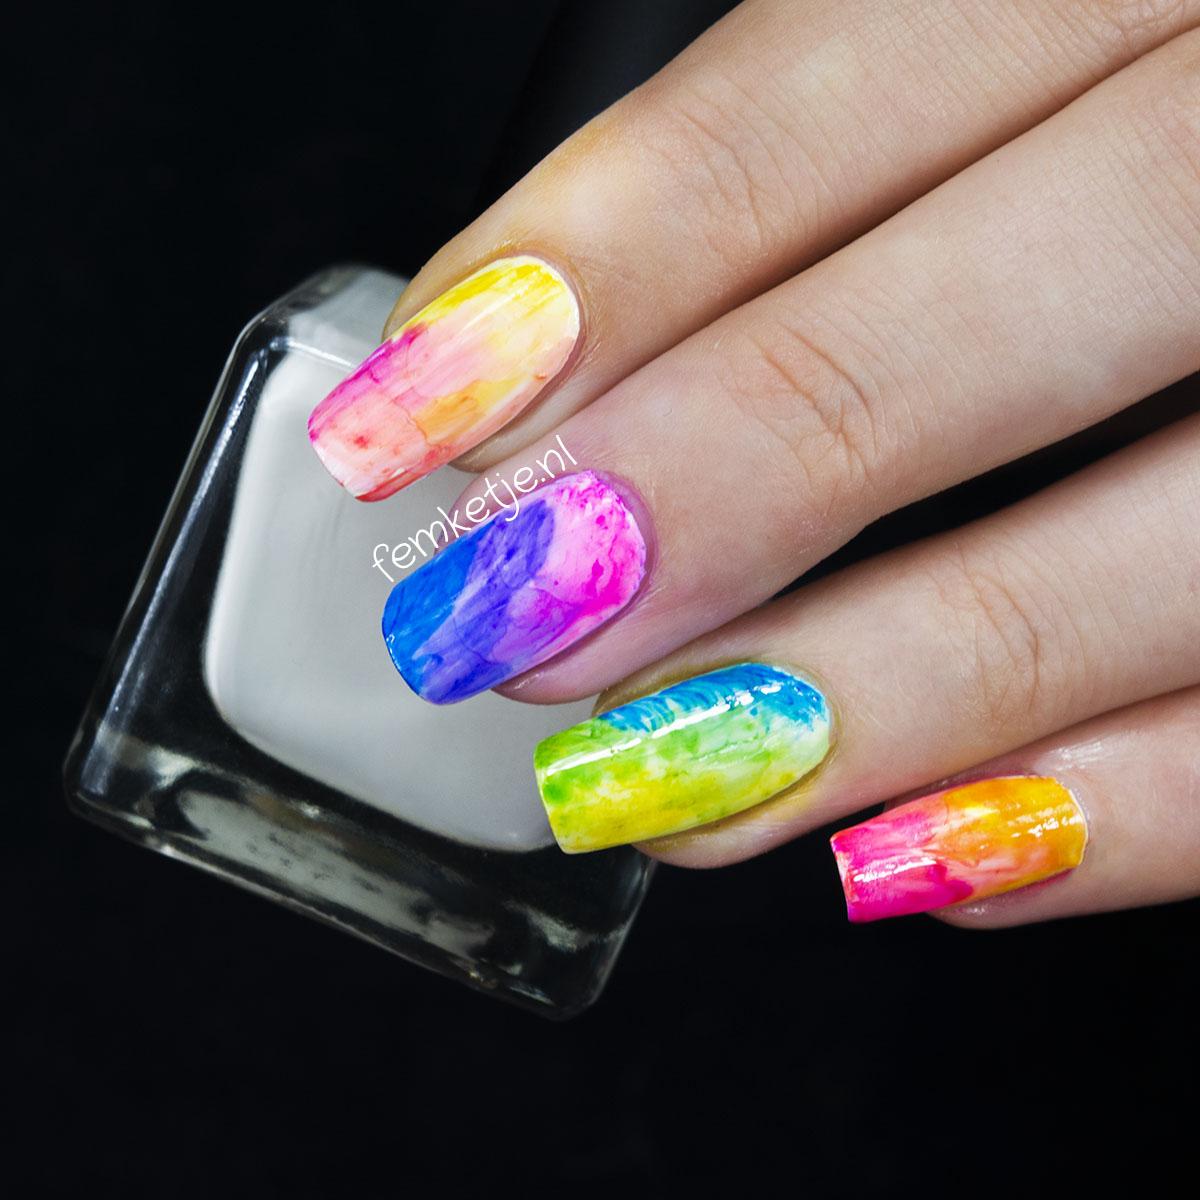 Sharpie Nail Art Femketje